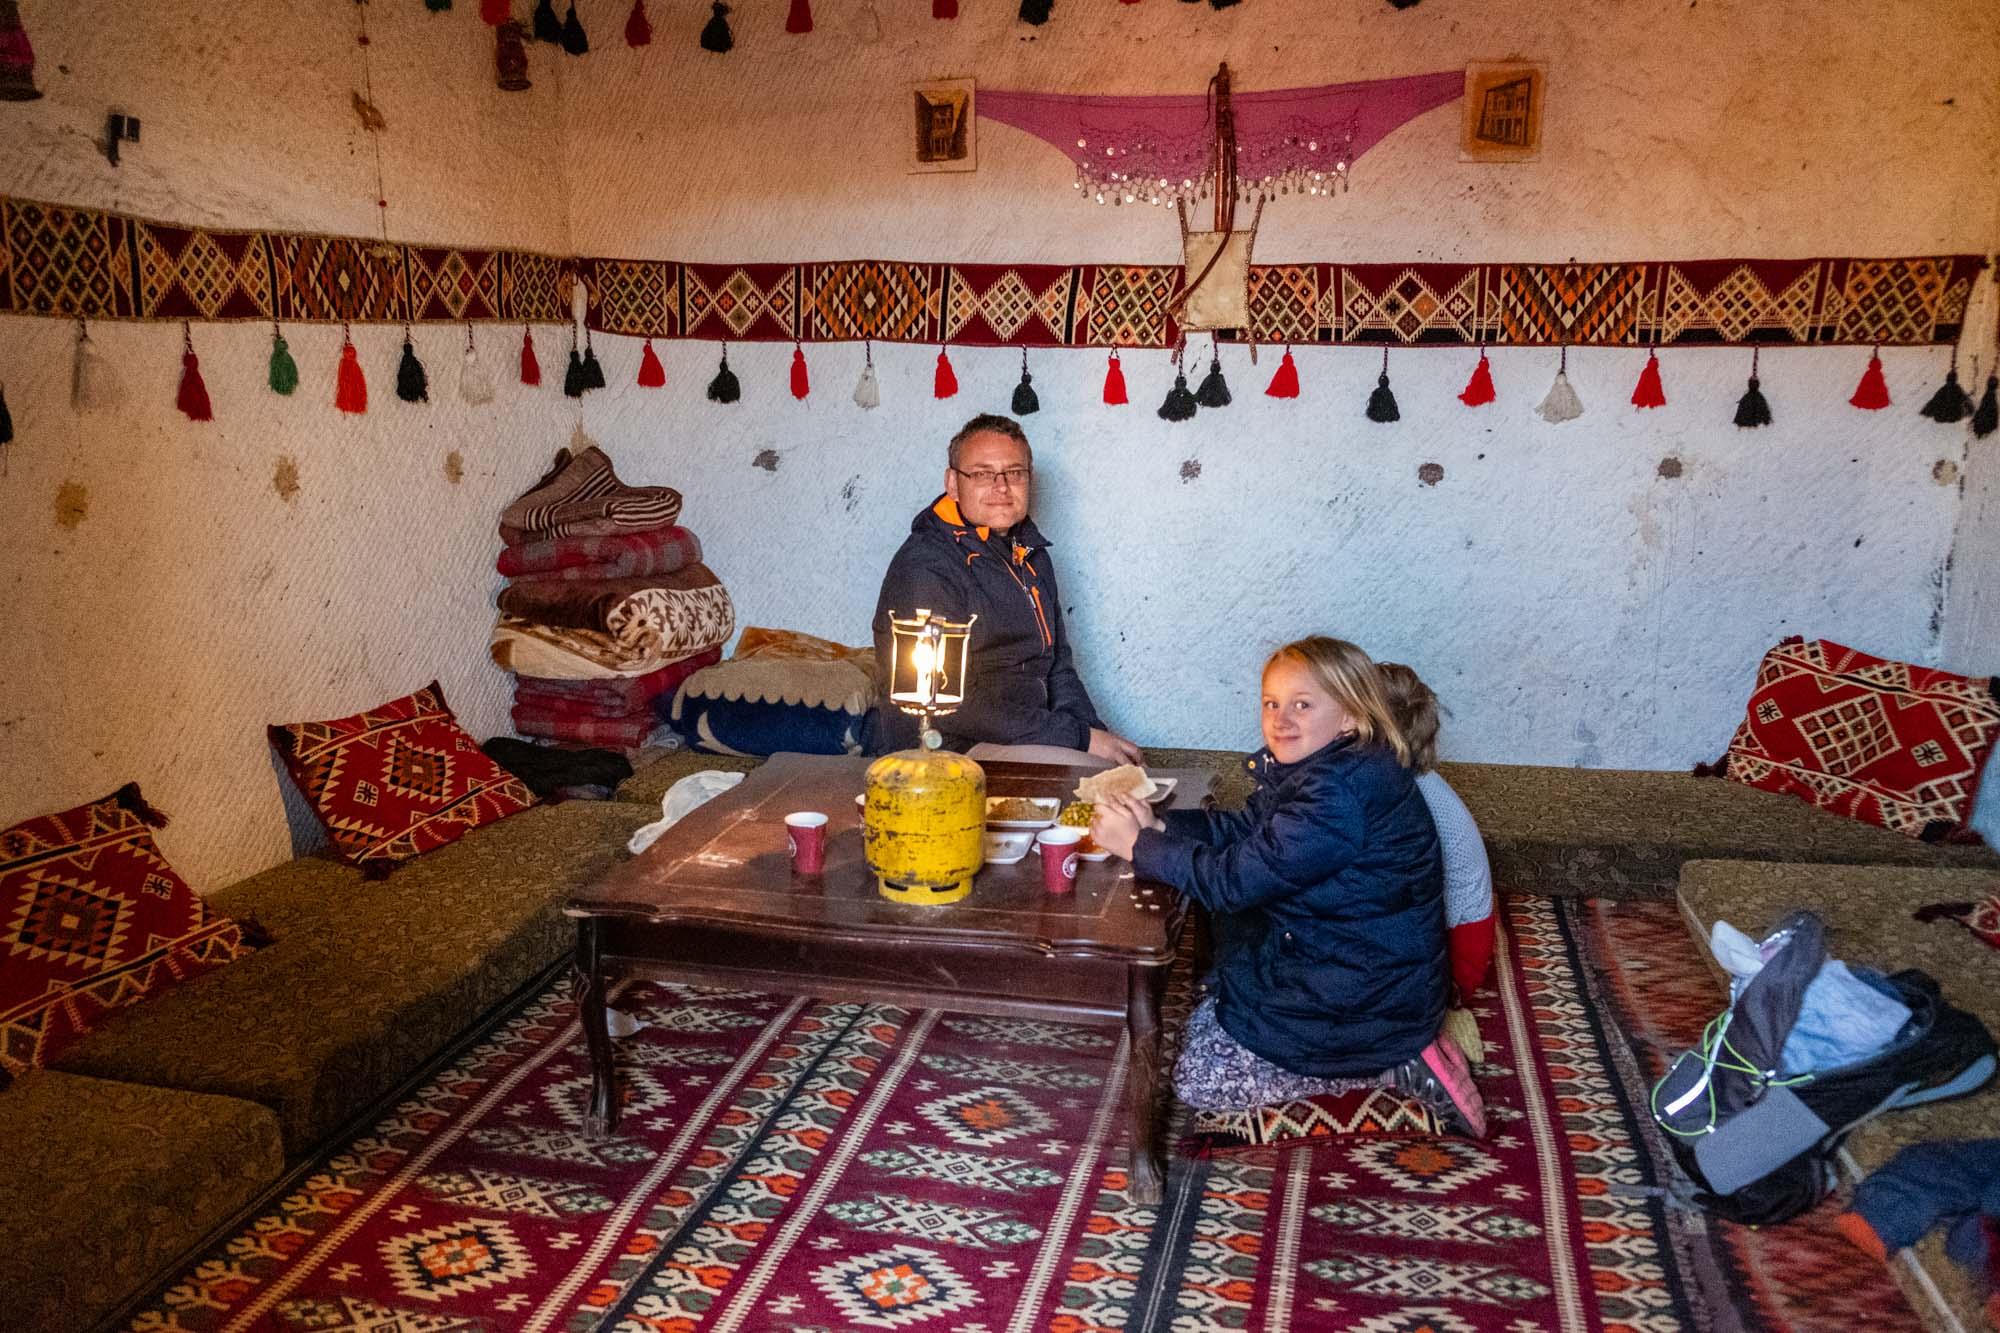 Bedouin cave Jordan Little Petra